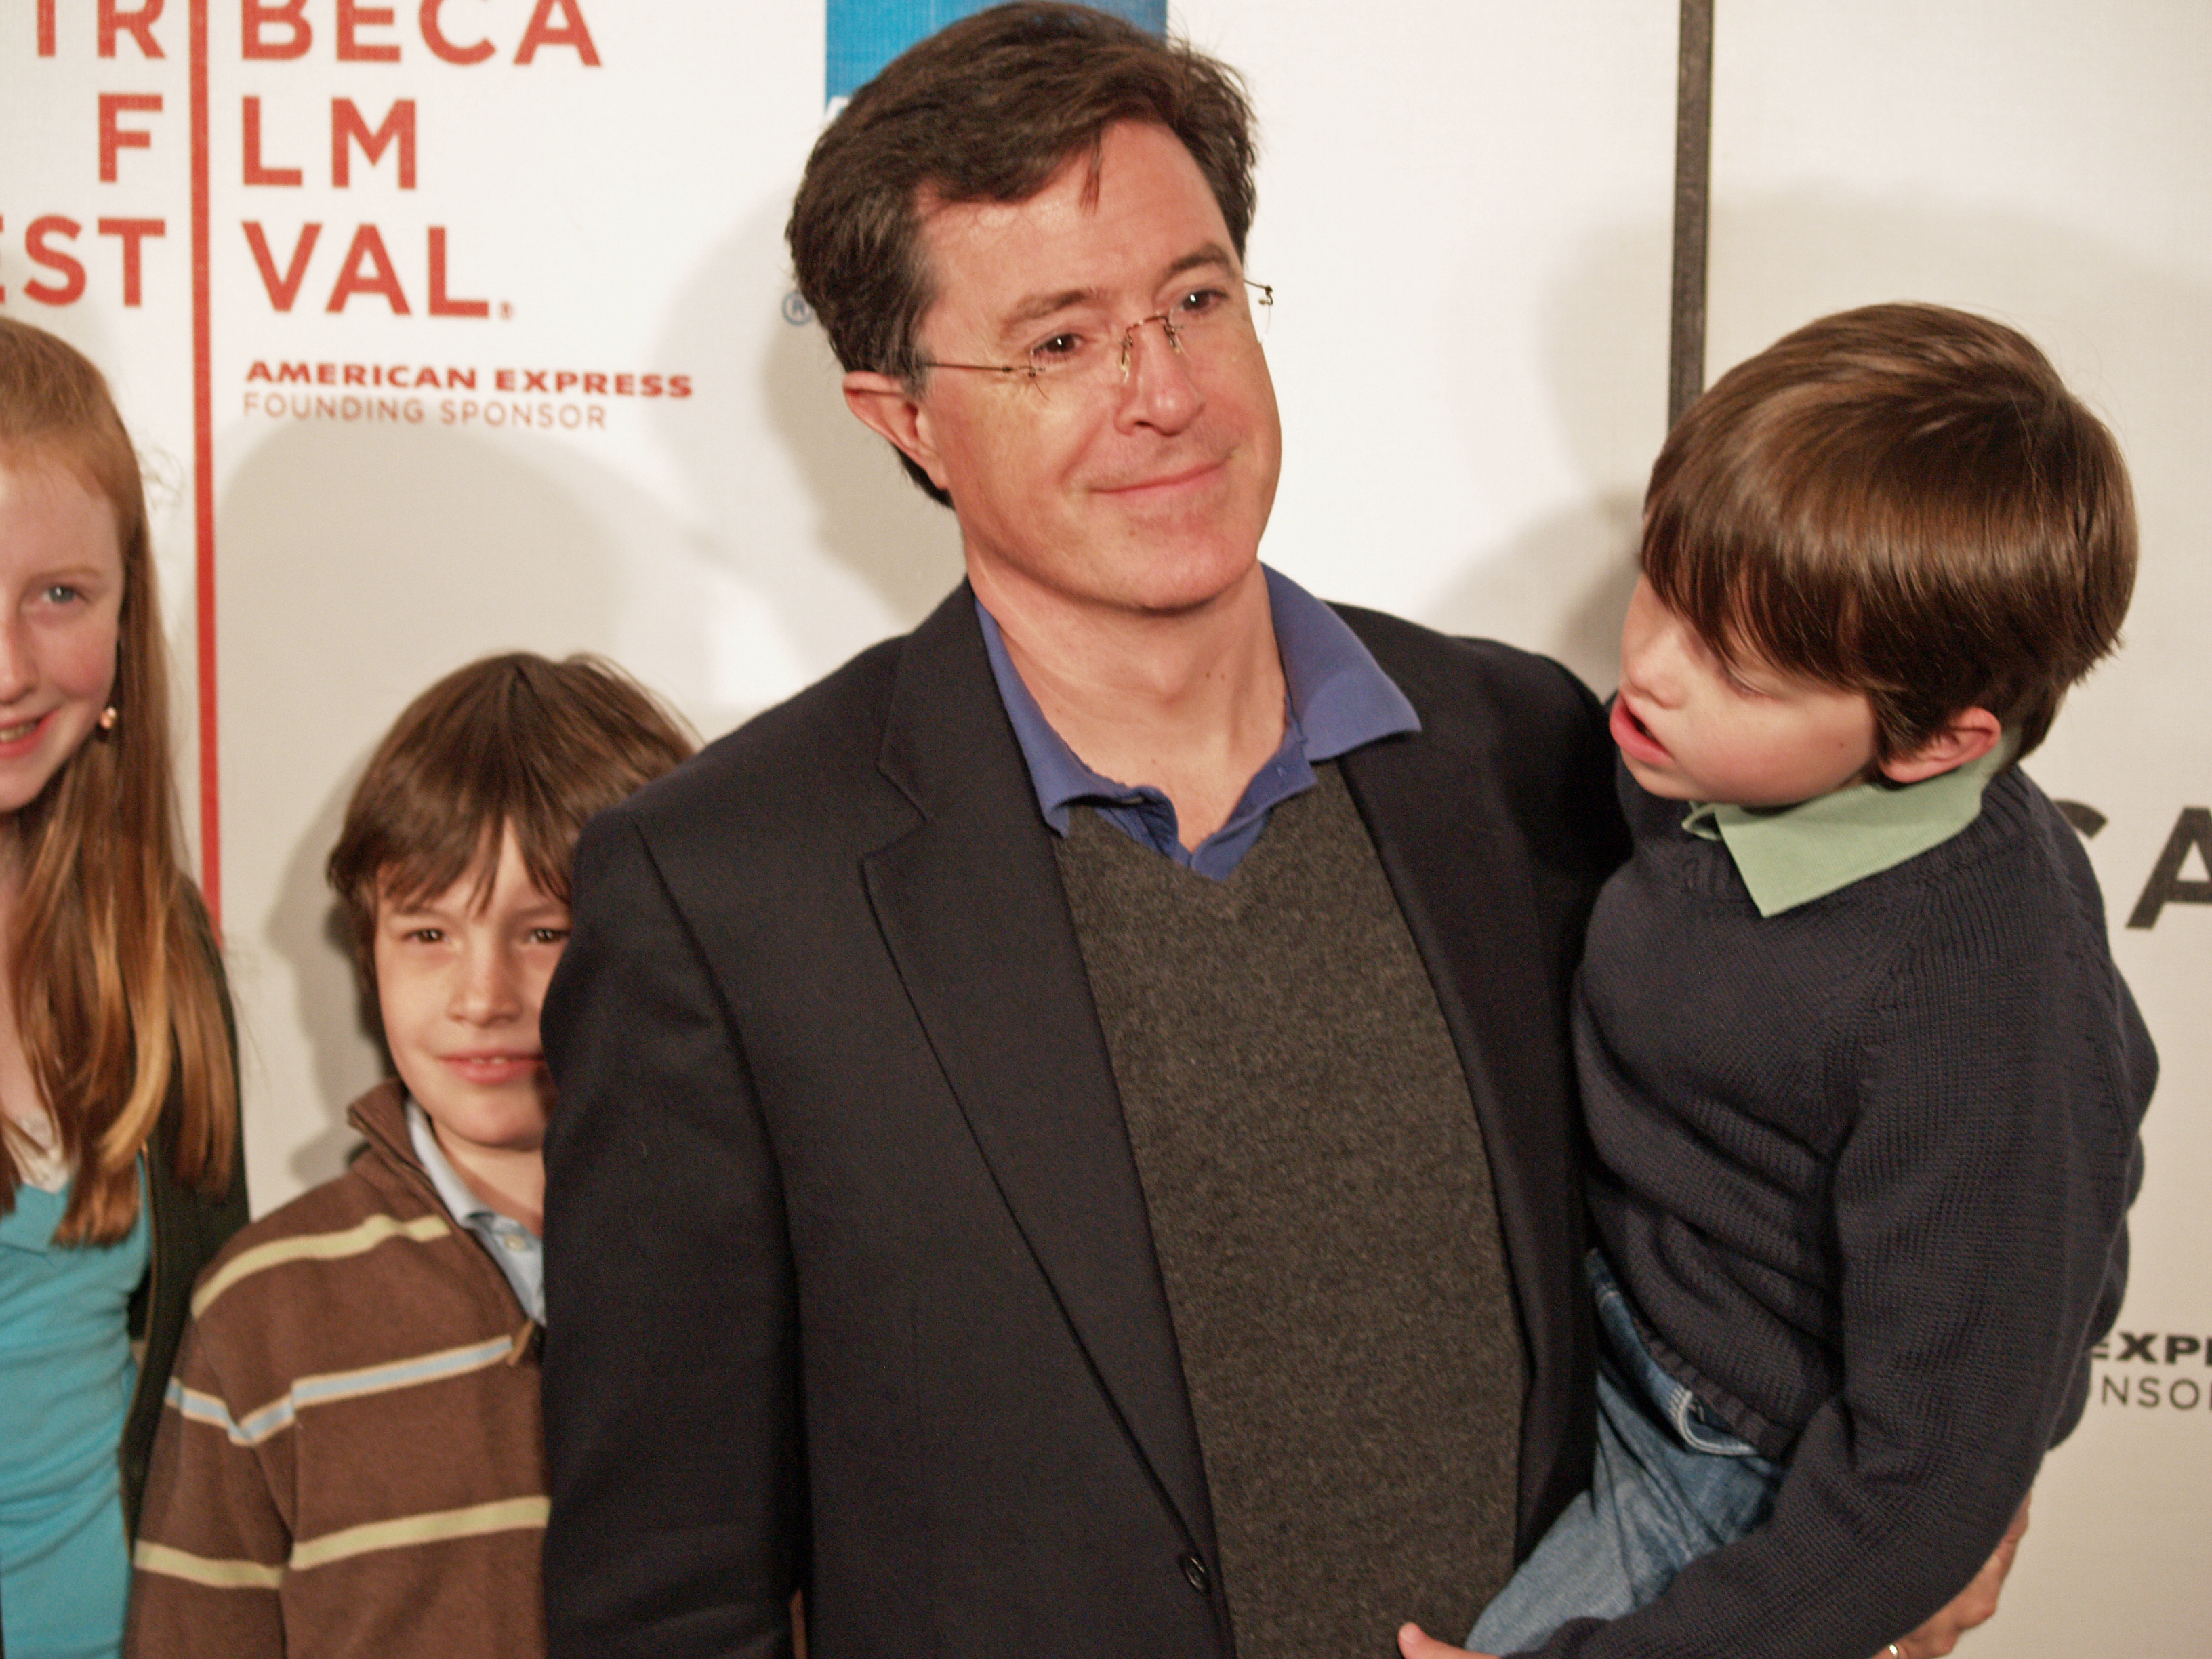 File:Stephen Colbert and sons 2 by David Shankbone jpg - Wikimedia